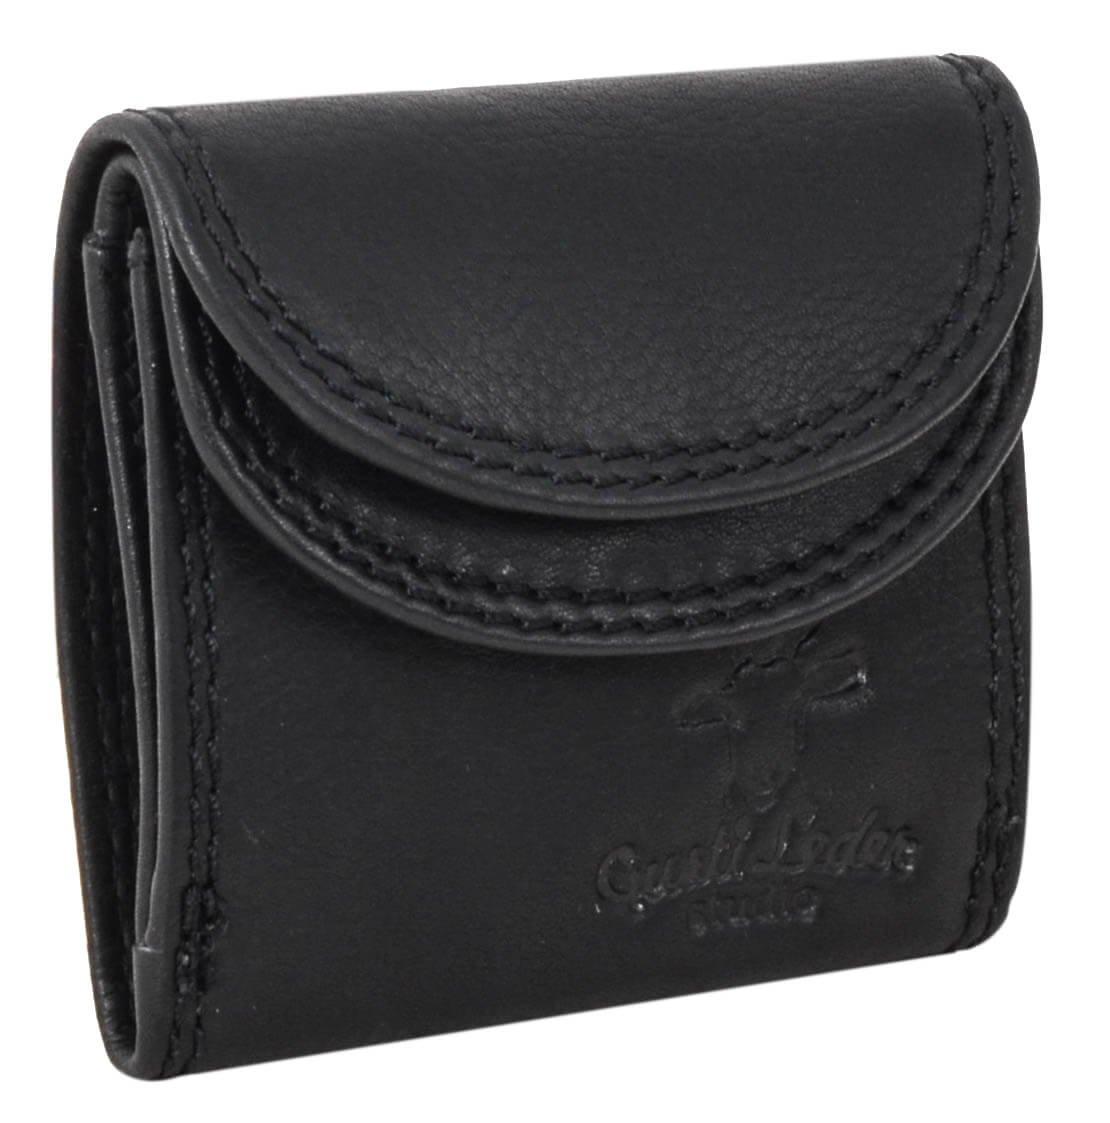 "'Gusti Leather Studio ""Leif Purse Girls Mini Purse Men Wallet Purse Small Wallet Vintage Purse Money Cash Unisex Practical 2A68Black/9 Gusti Leder 2A68-22-9"